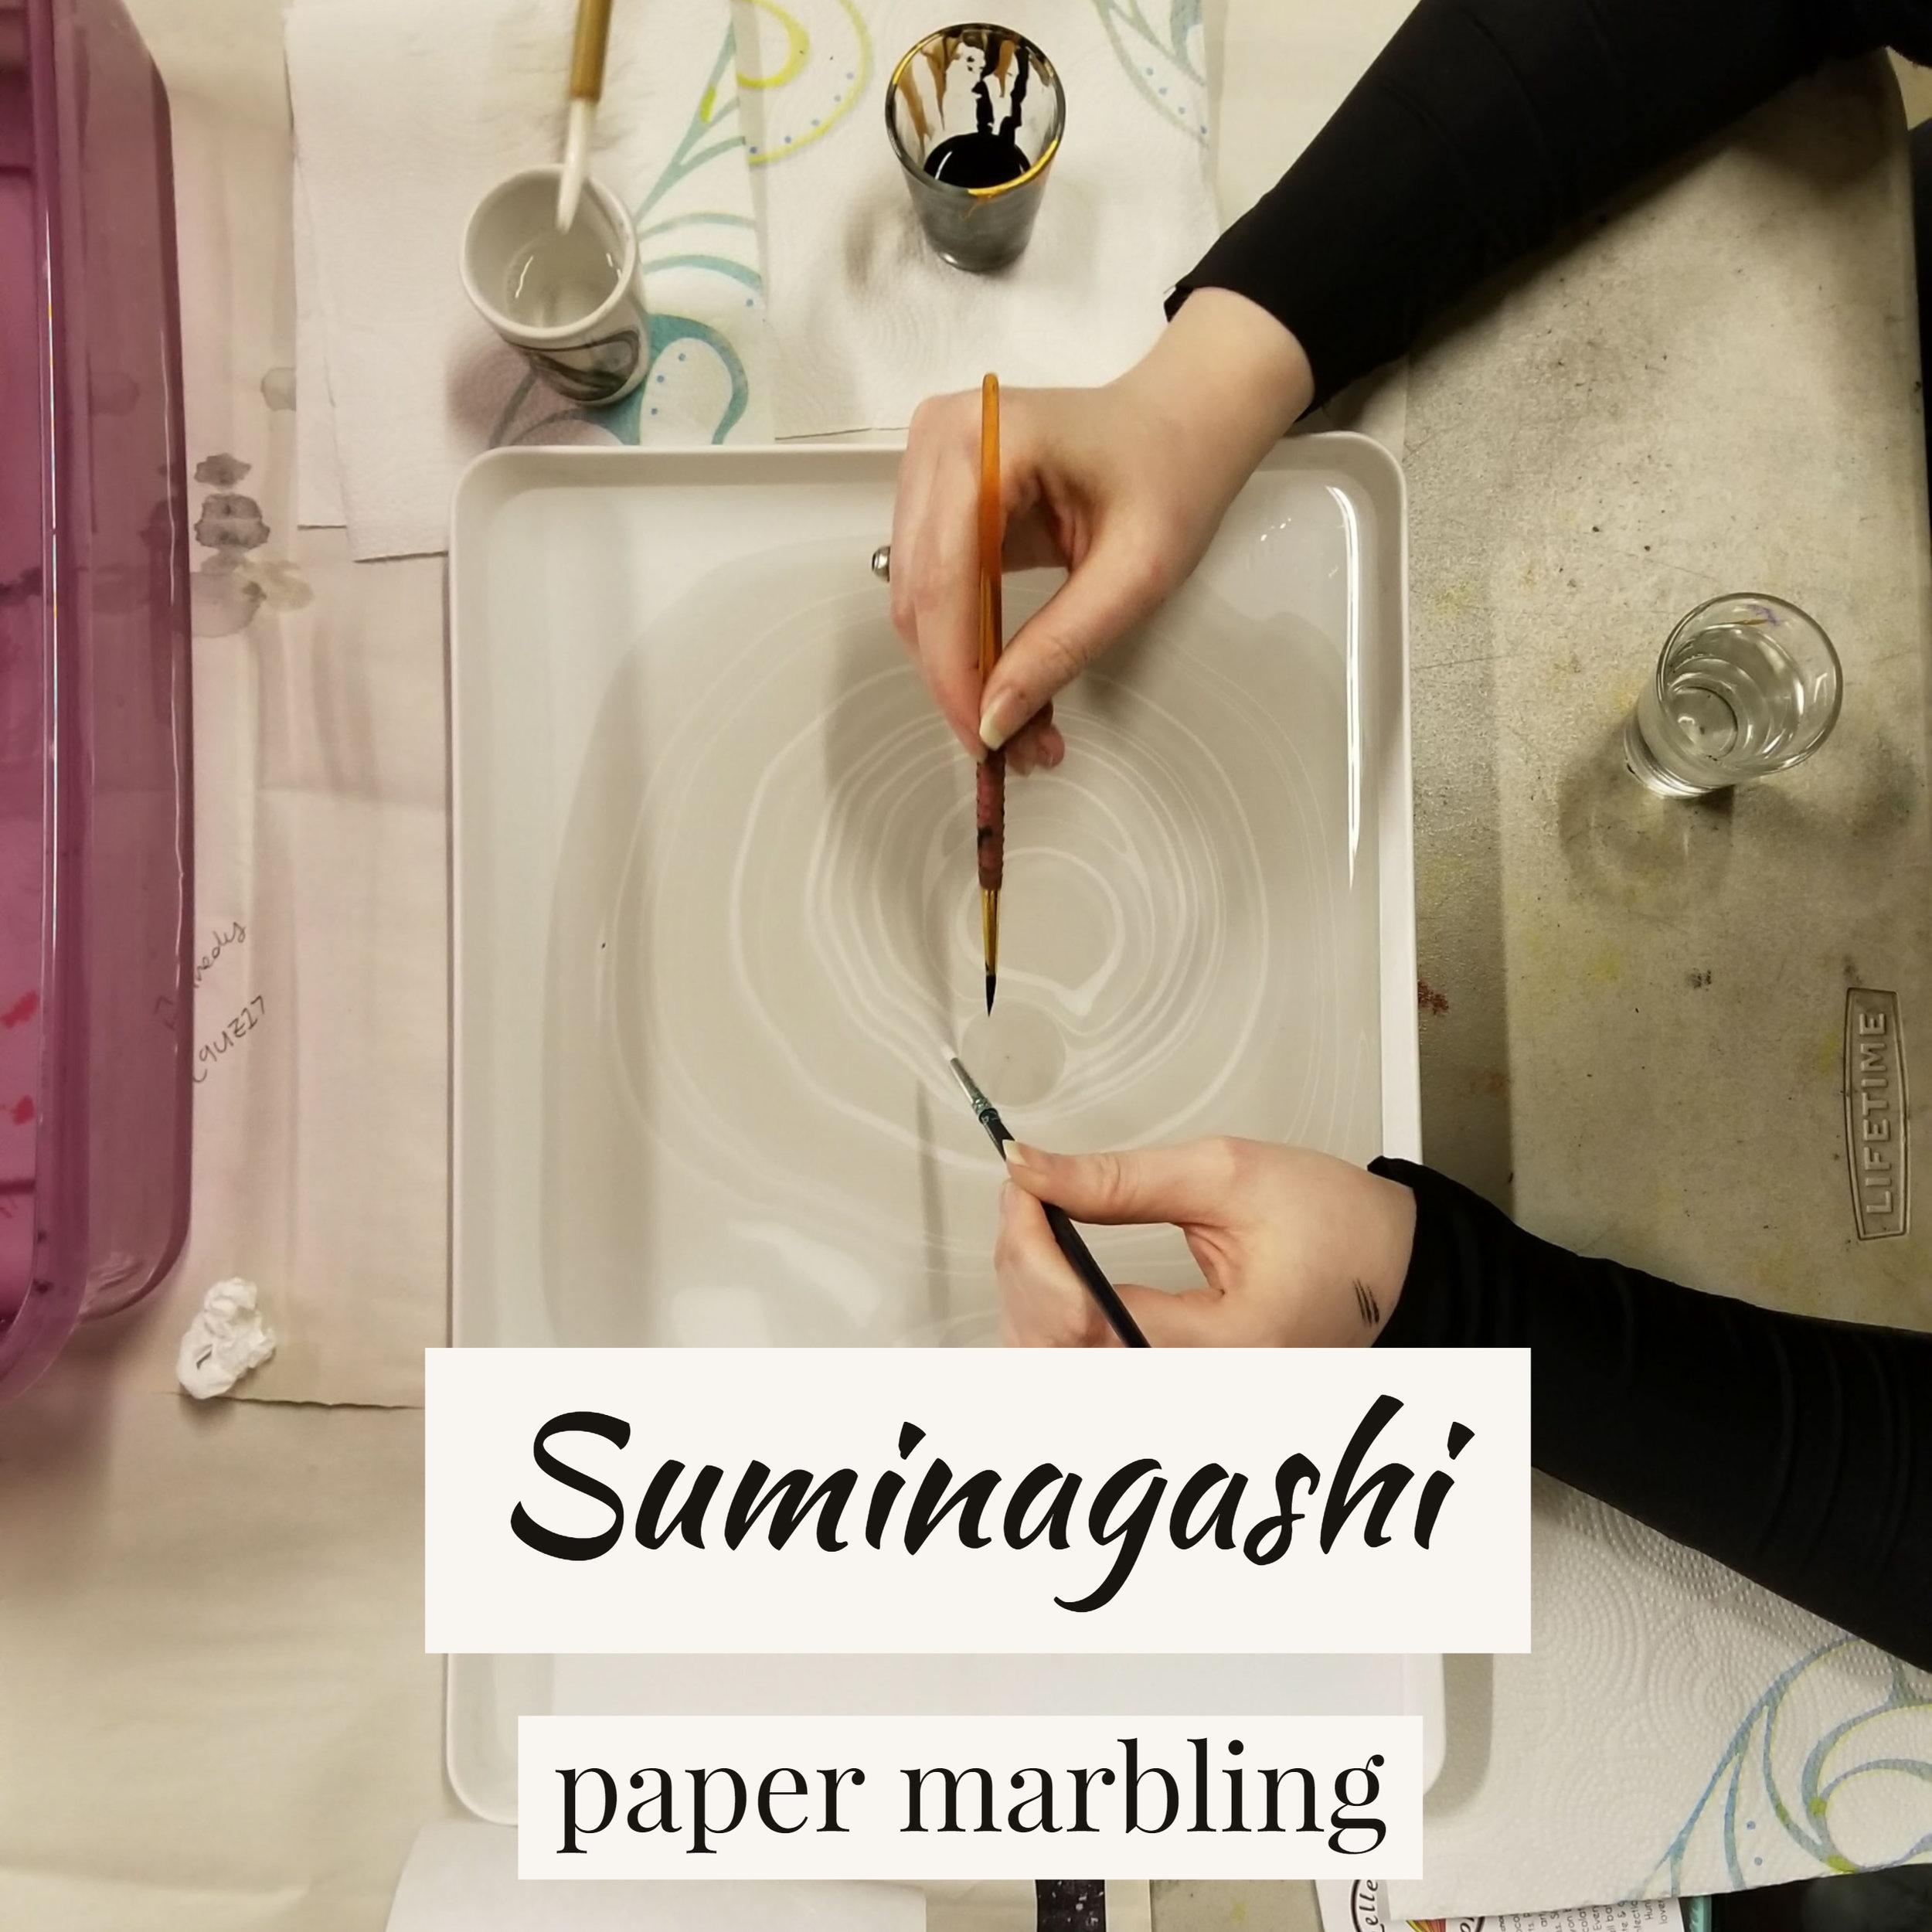 Suminagashi: Paper Marbling @ Green Pea Press Studio 122 | Huntsville | Alabama | United States